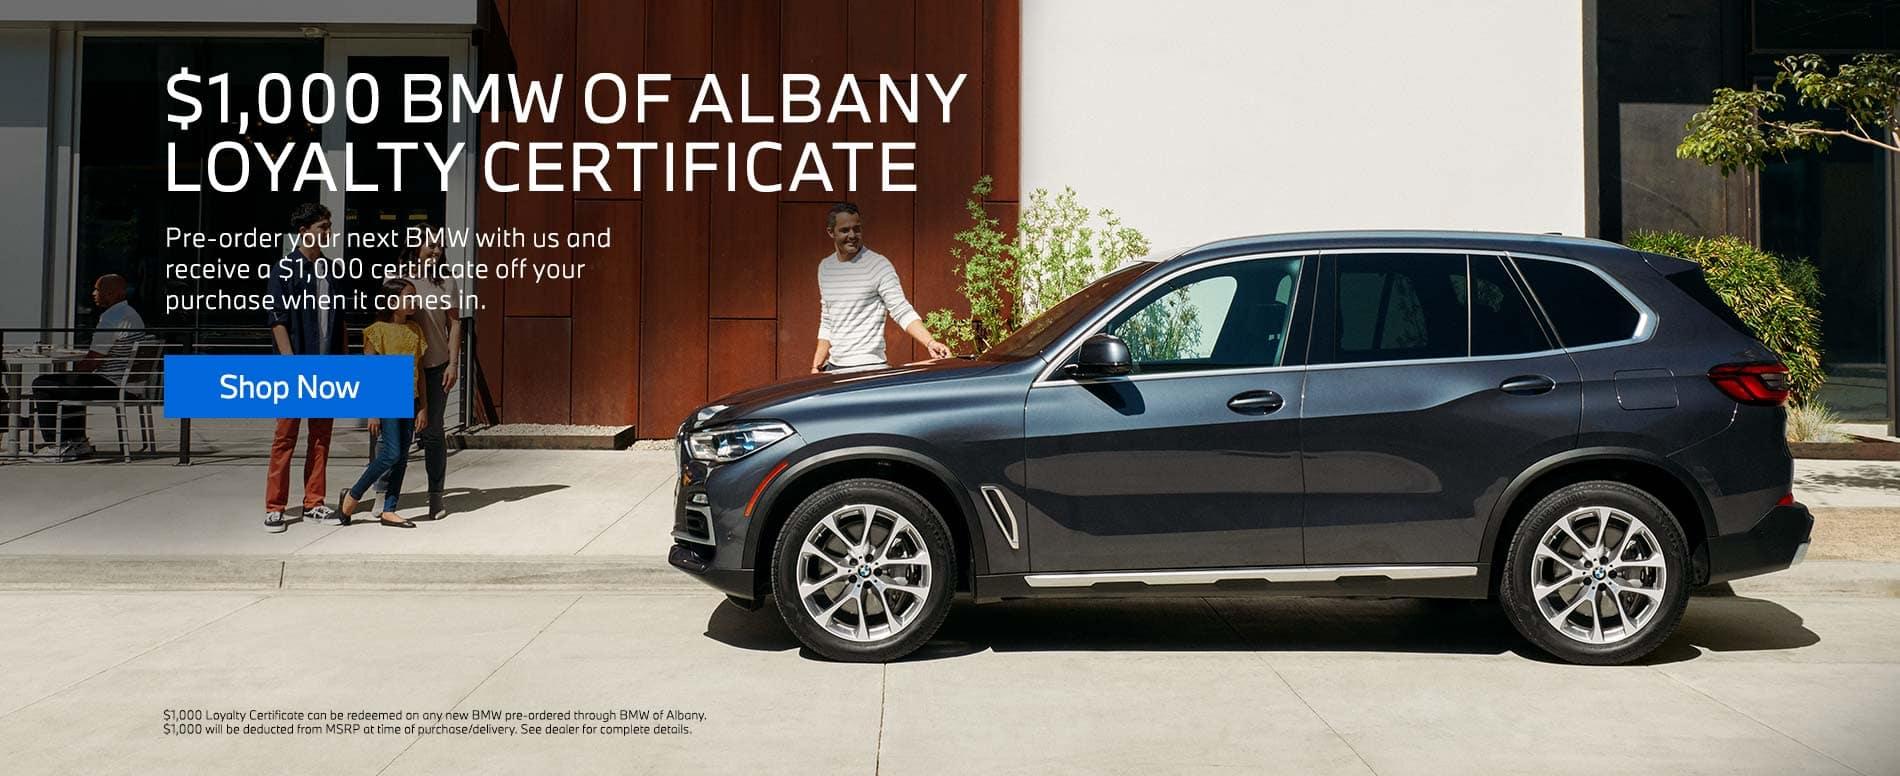 Loyalty Certificate